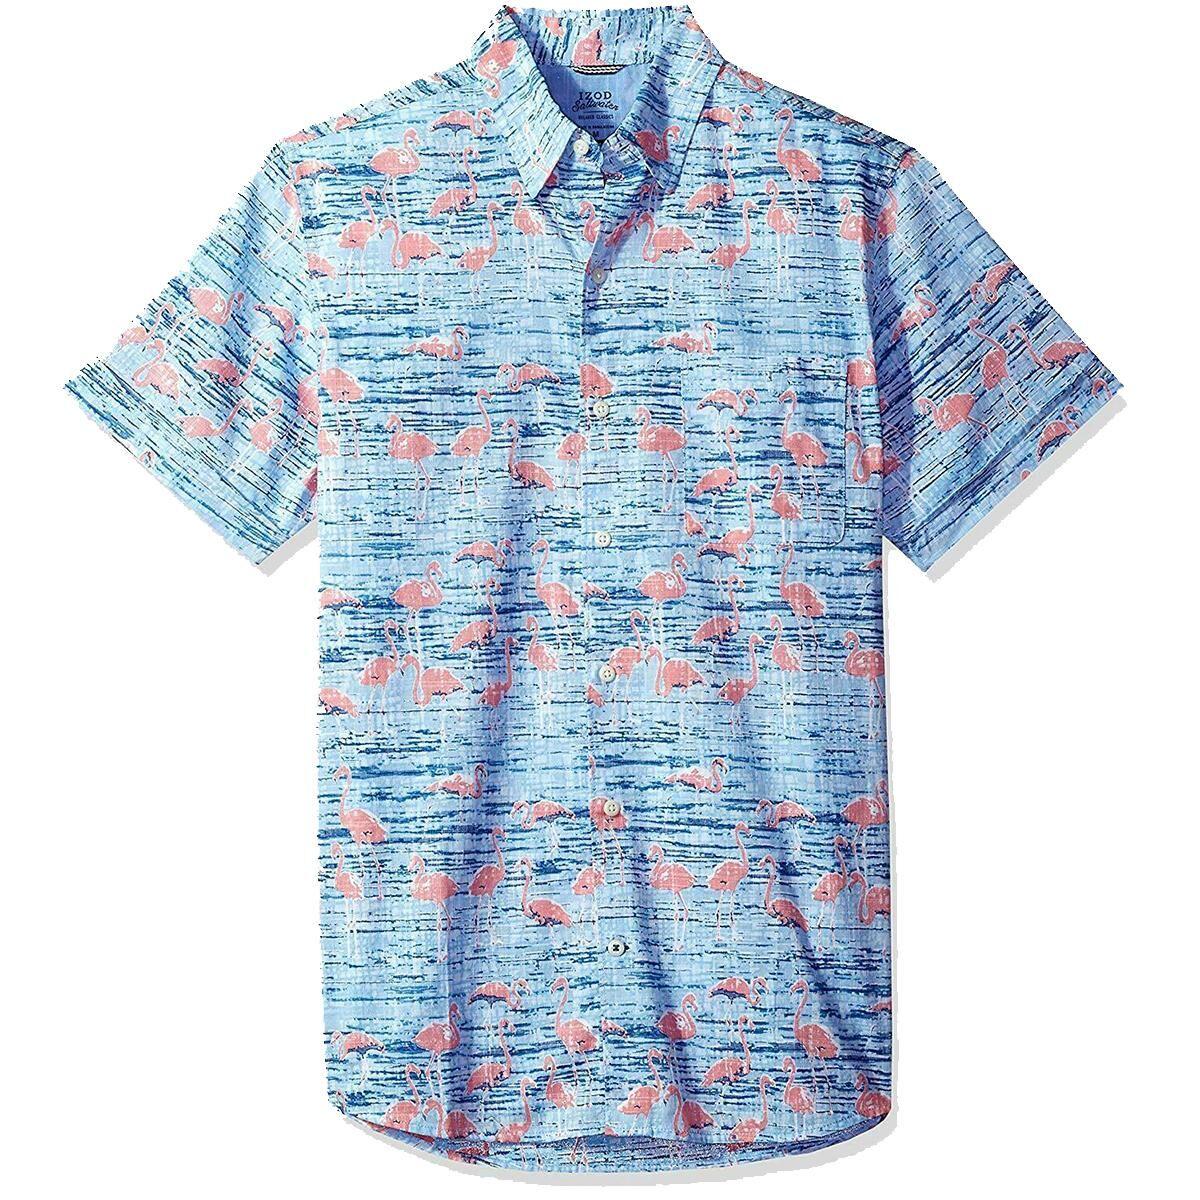 Izod Men's Dockside Flamingo Chambray Shirt - Blue, XL